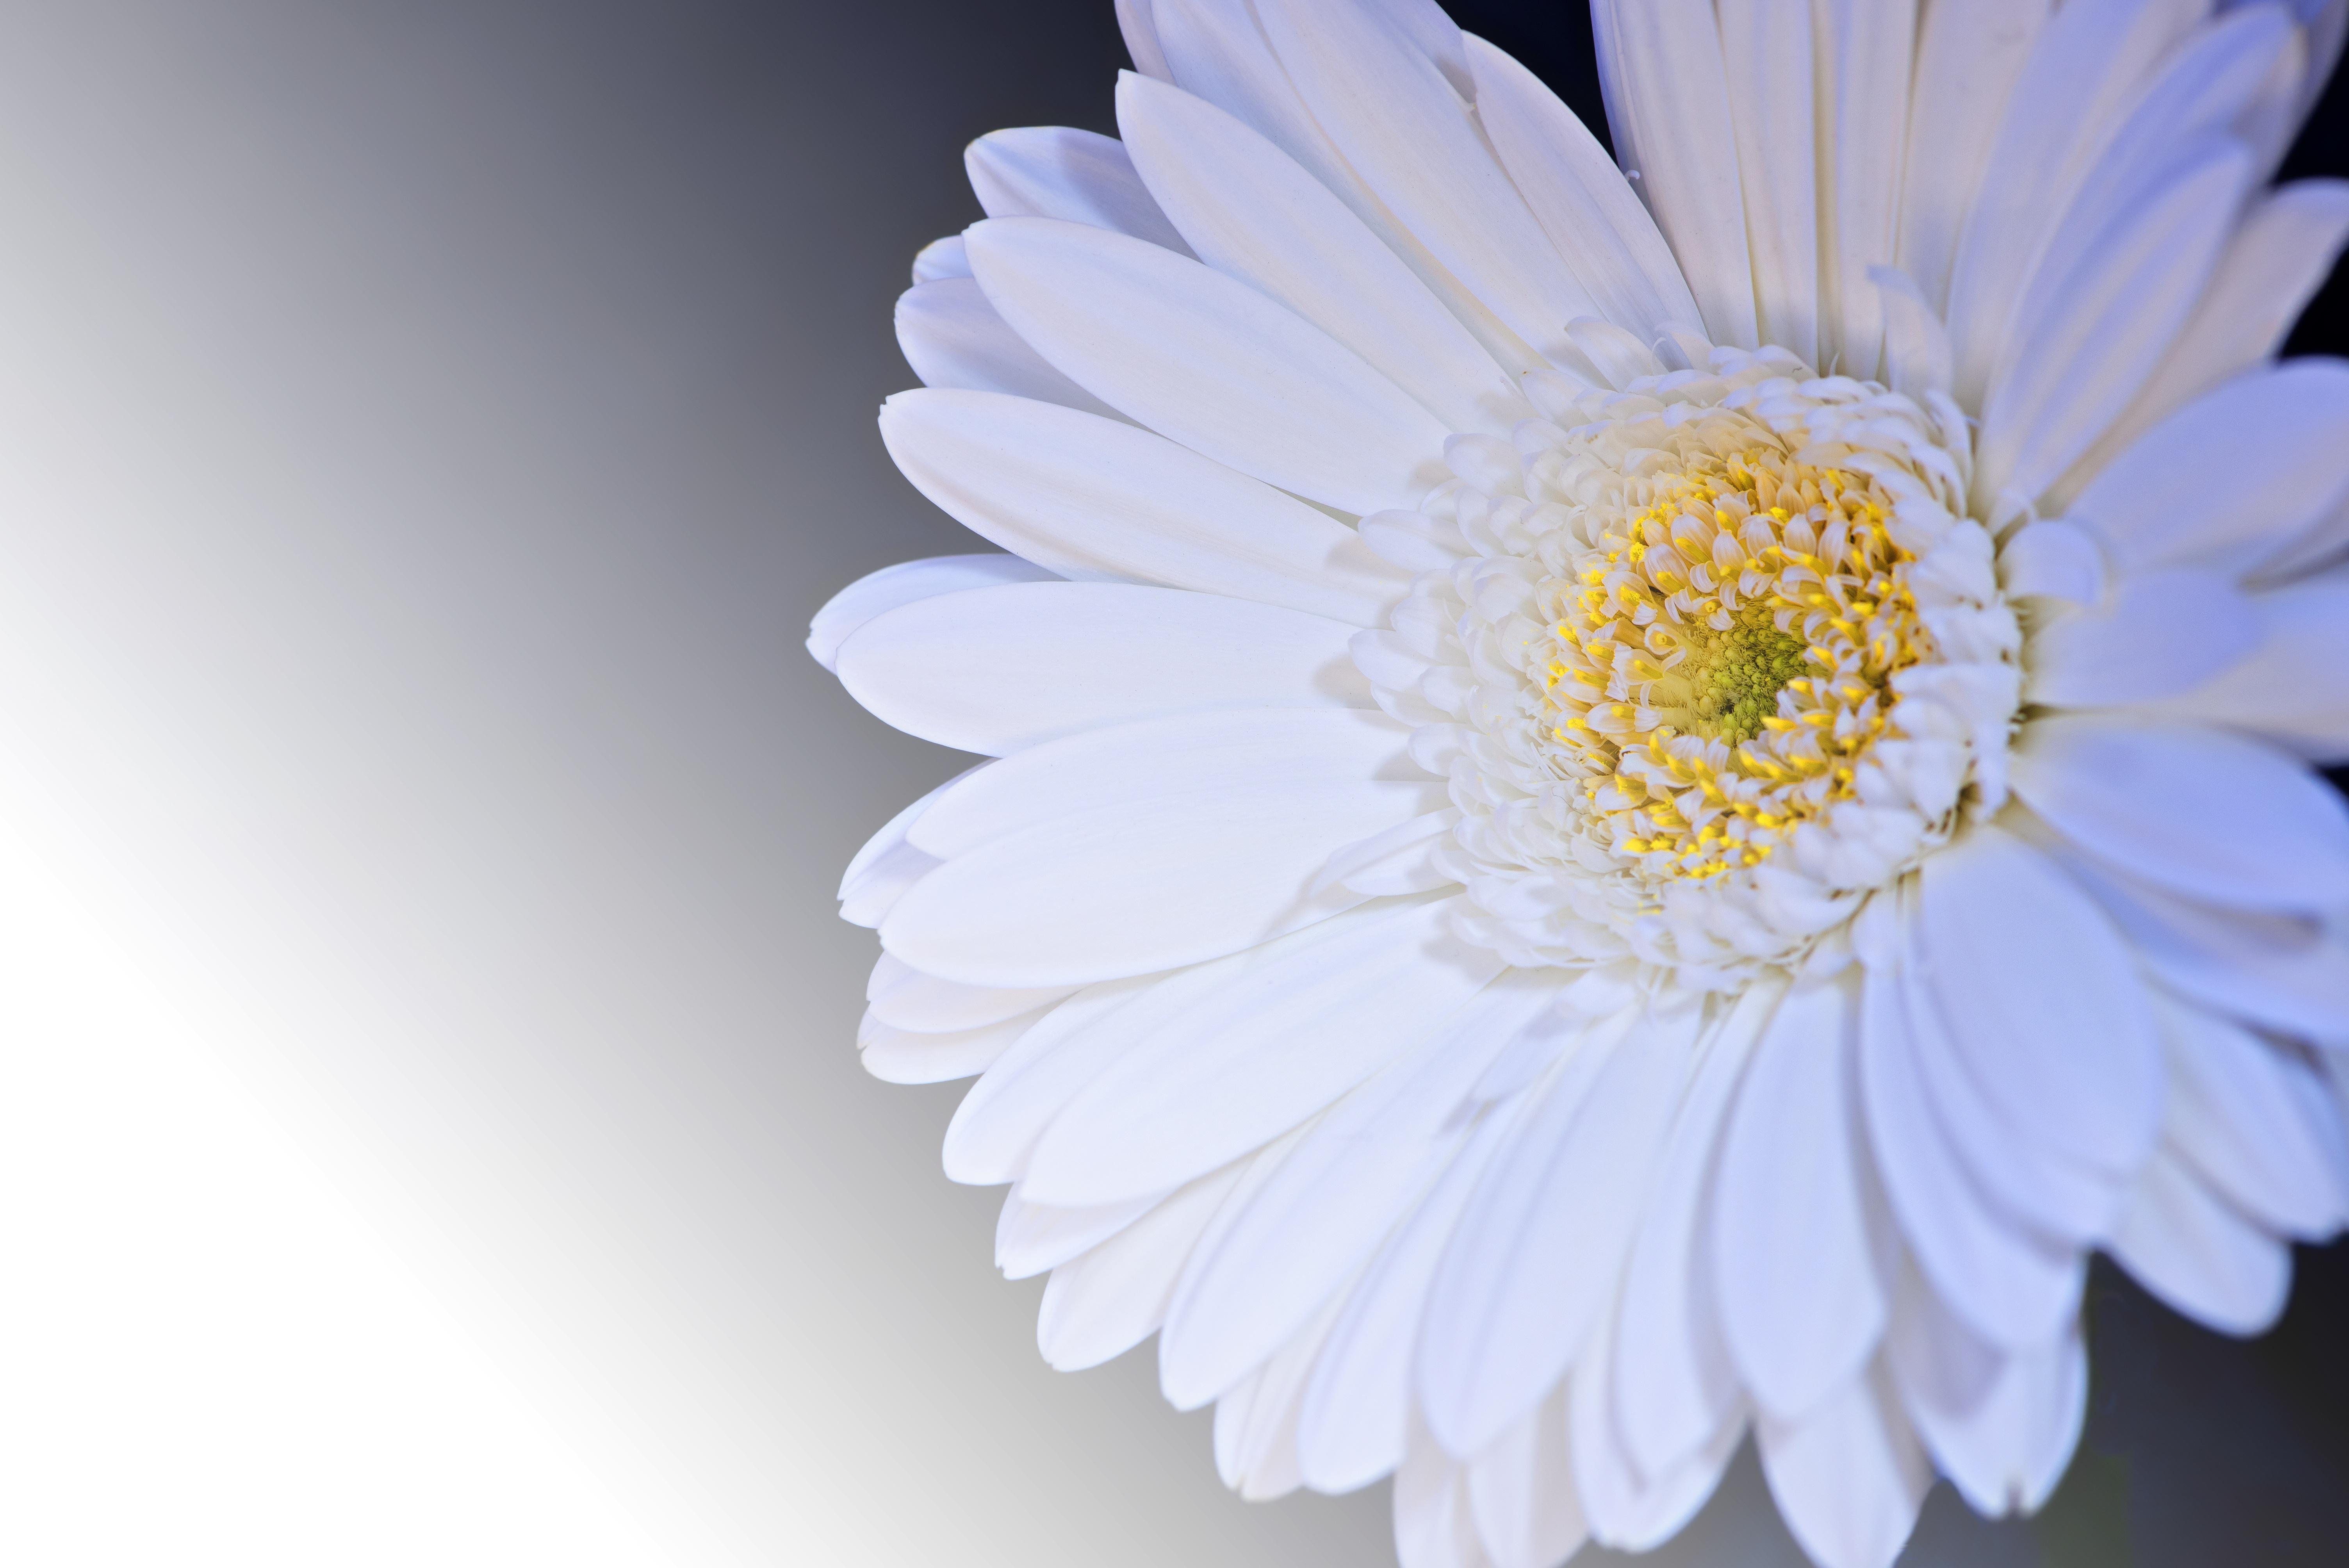 Free Images Blossom Petal Bloom White Flower Close Up Petals